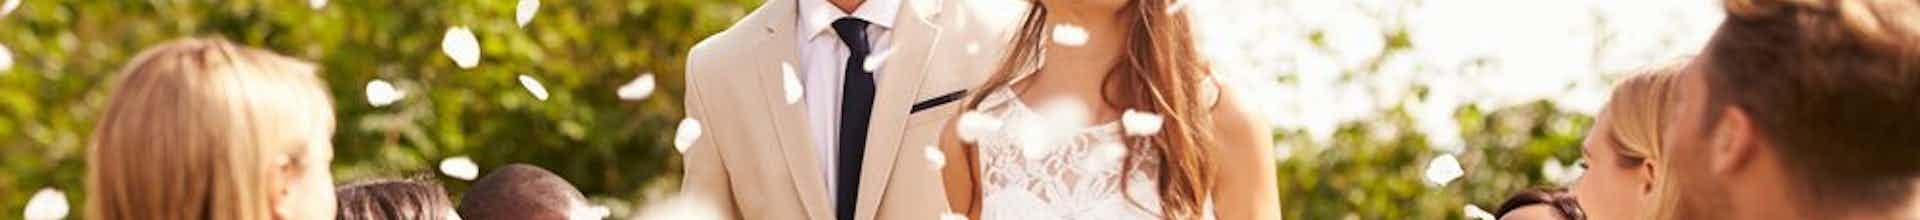 bruiloft muziek tijdens ceremonie